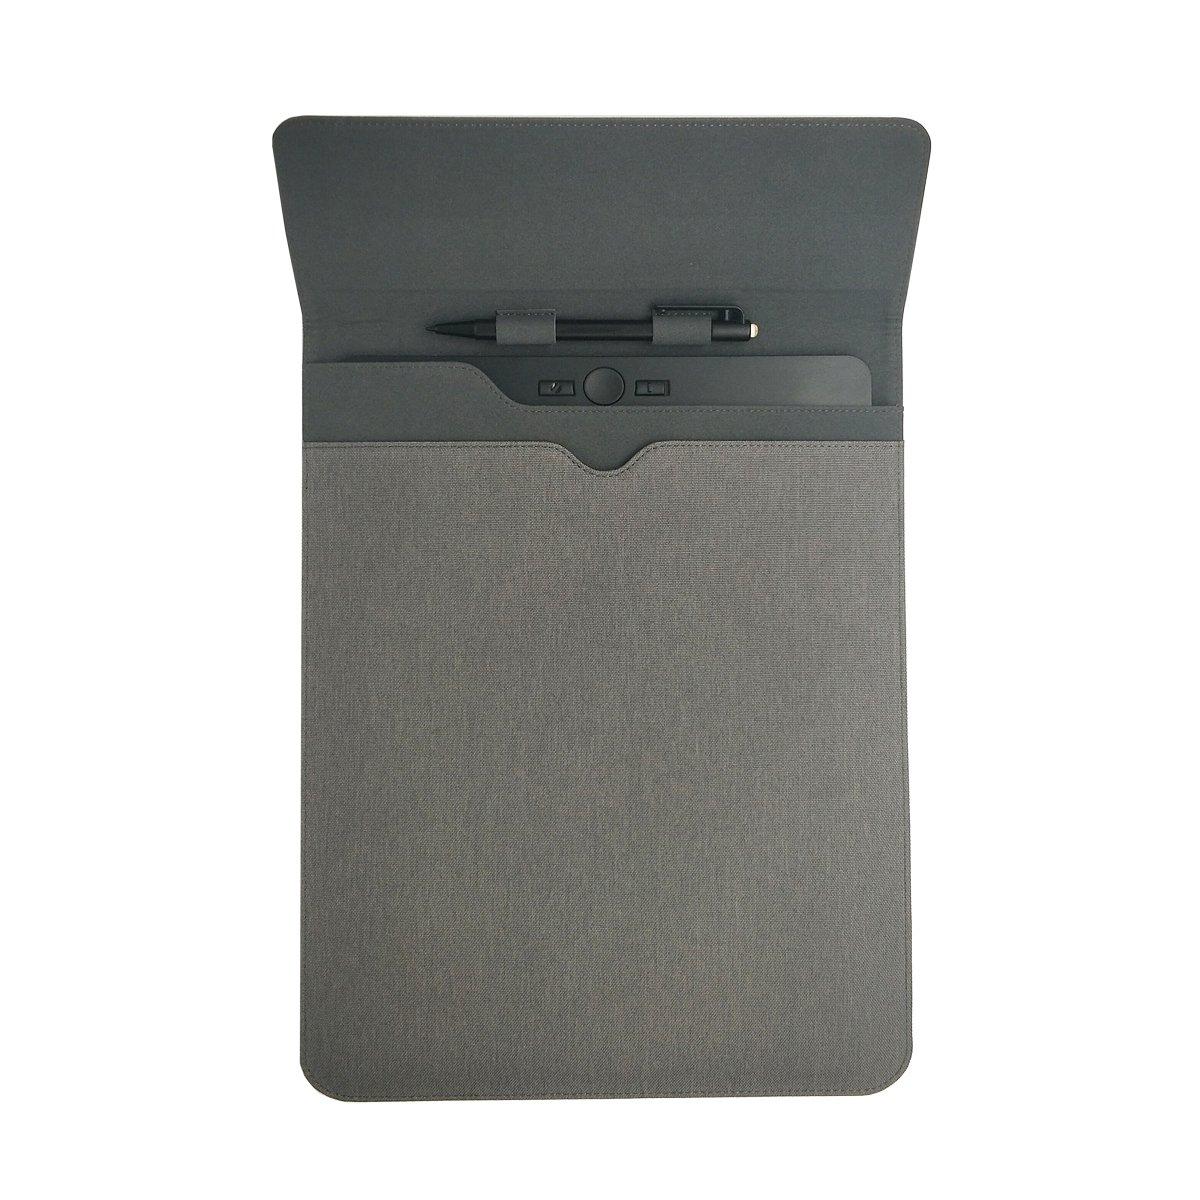 Xcivi Premium Sleeve Case for Boogie Board Blackboard 14-inch Writing Tablet Liquid Crystal Paper 8.5x11 by xcivi